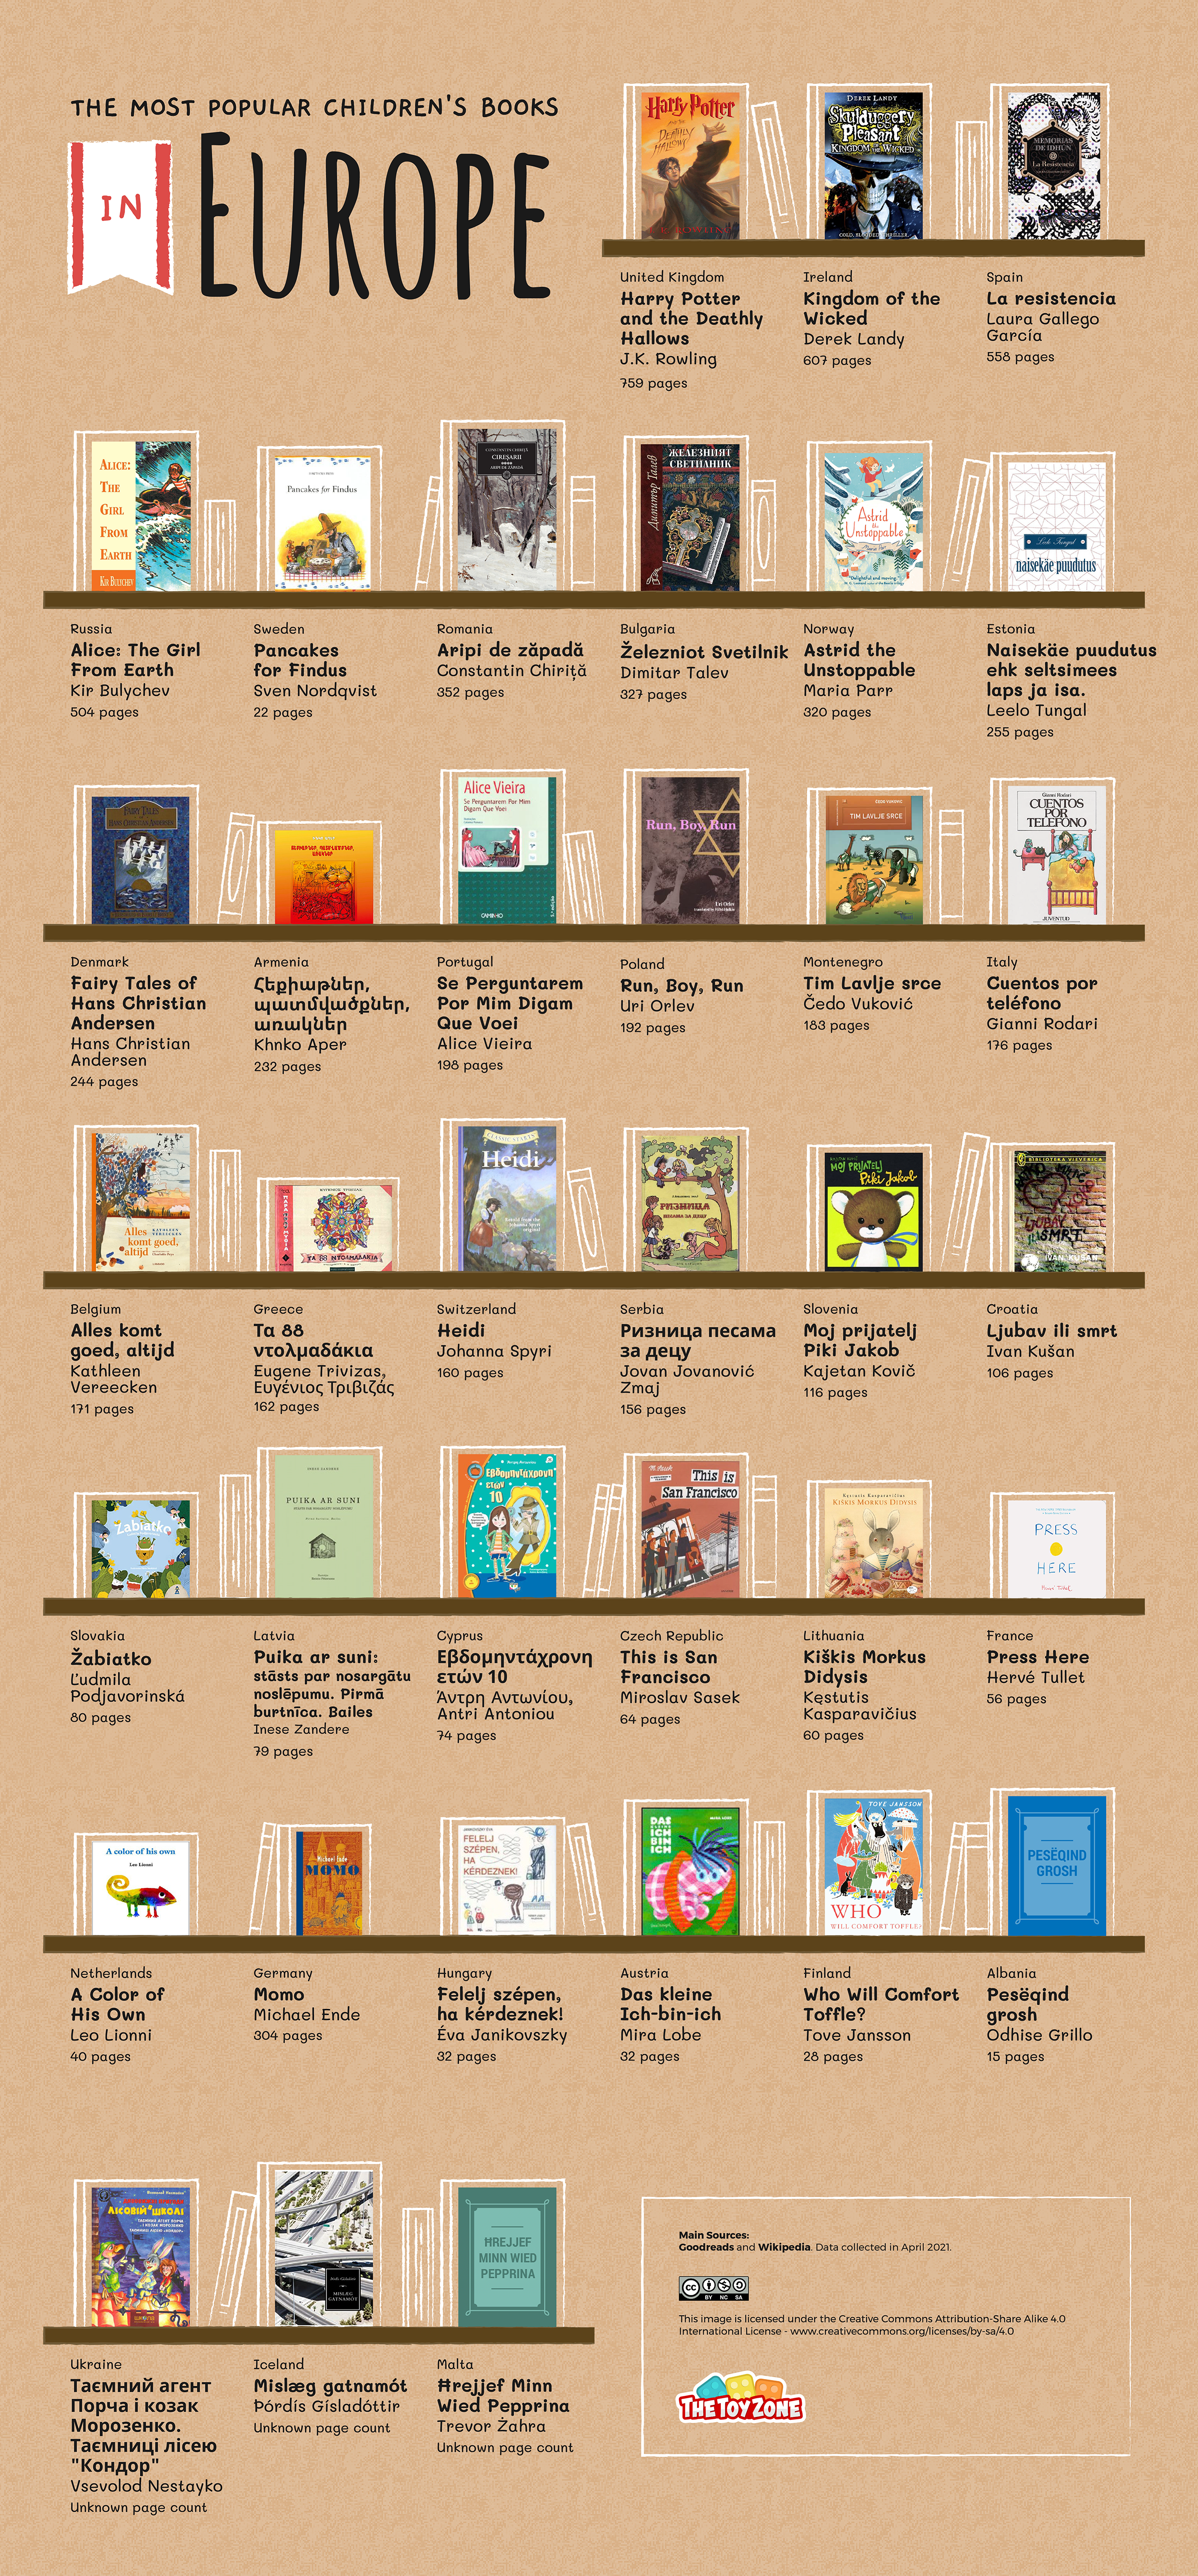 Most popular children's books in Europe bookshelf graphic